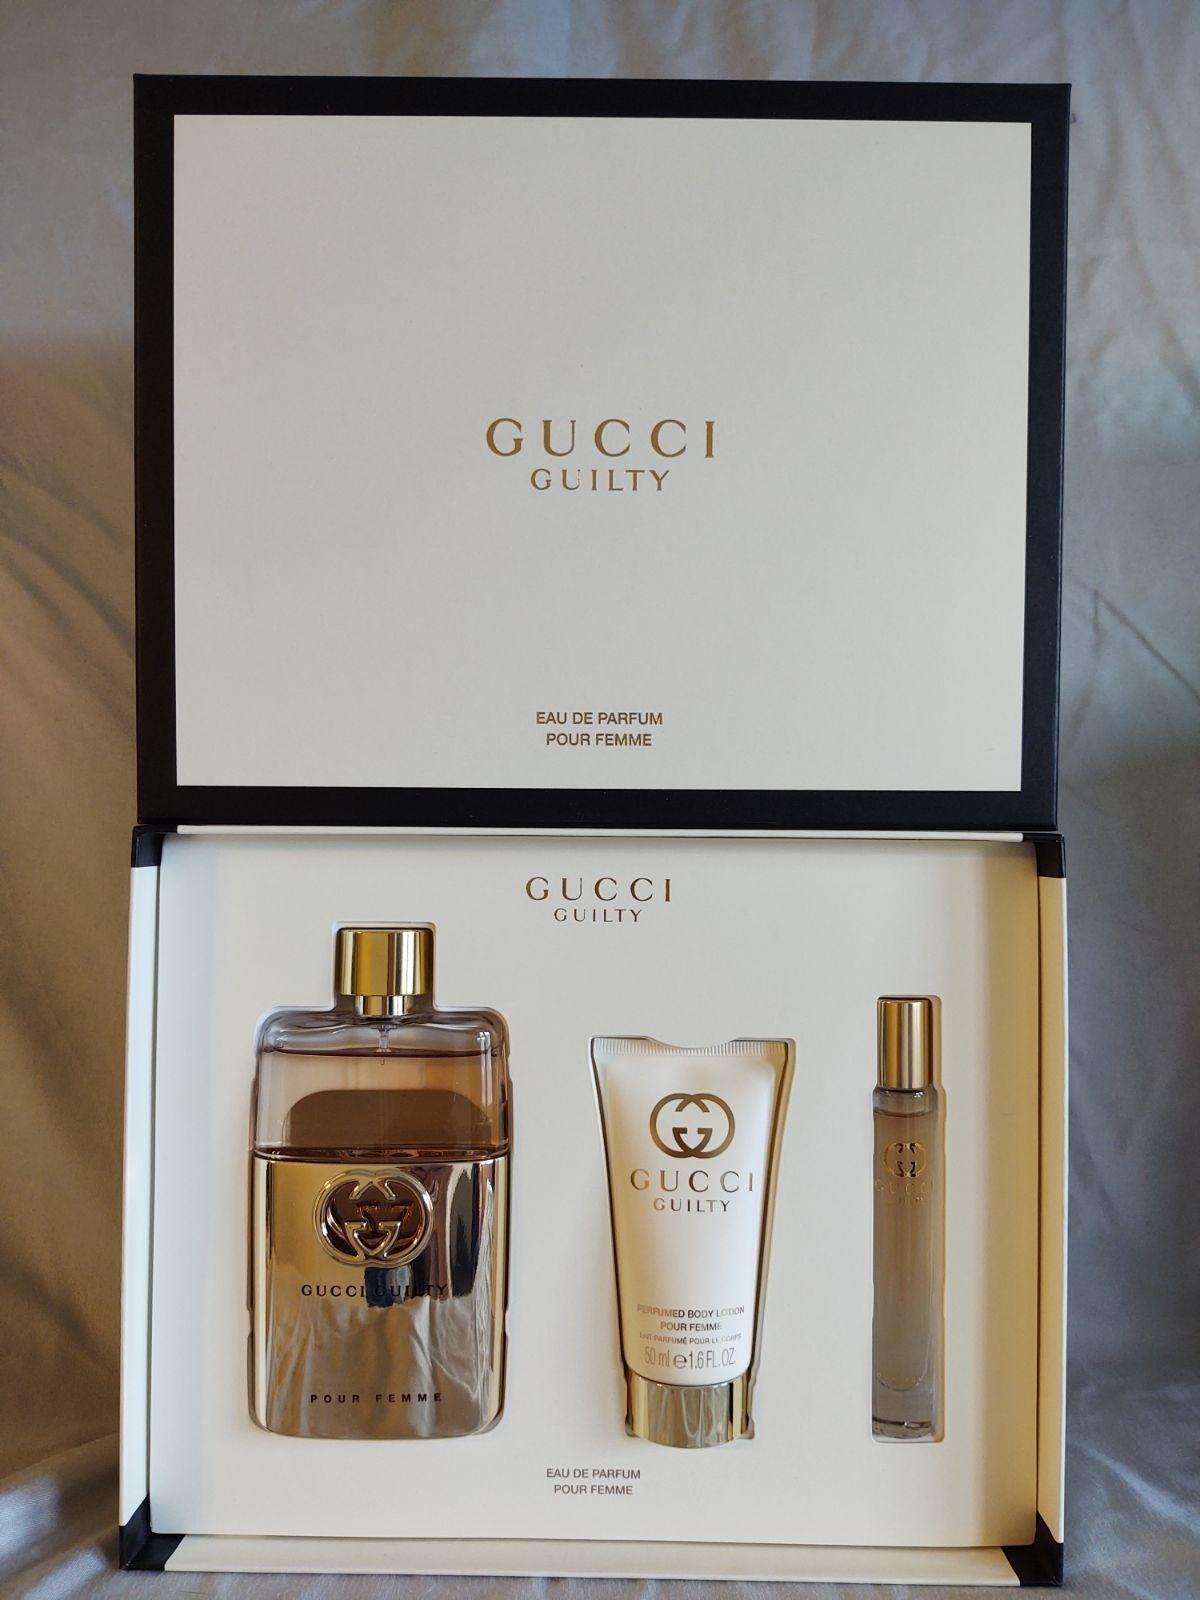 Gucci Guilty perfume set